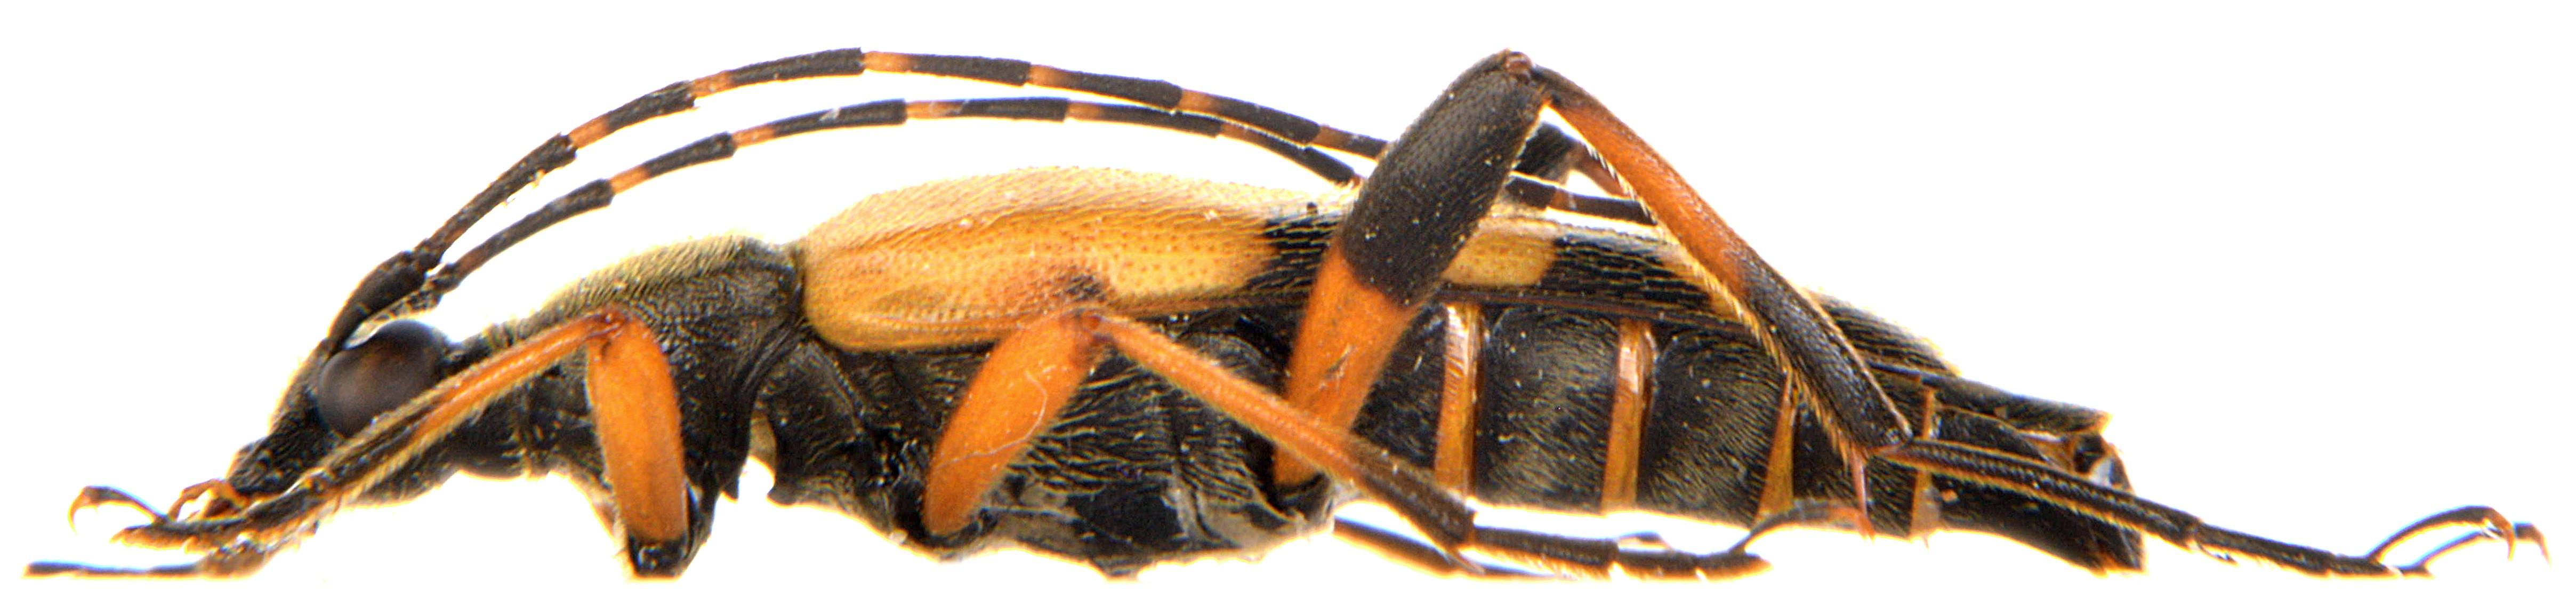 Rutpela maculata ♂